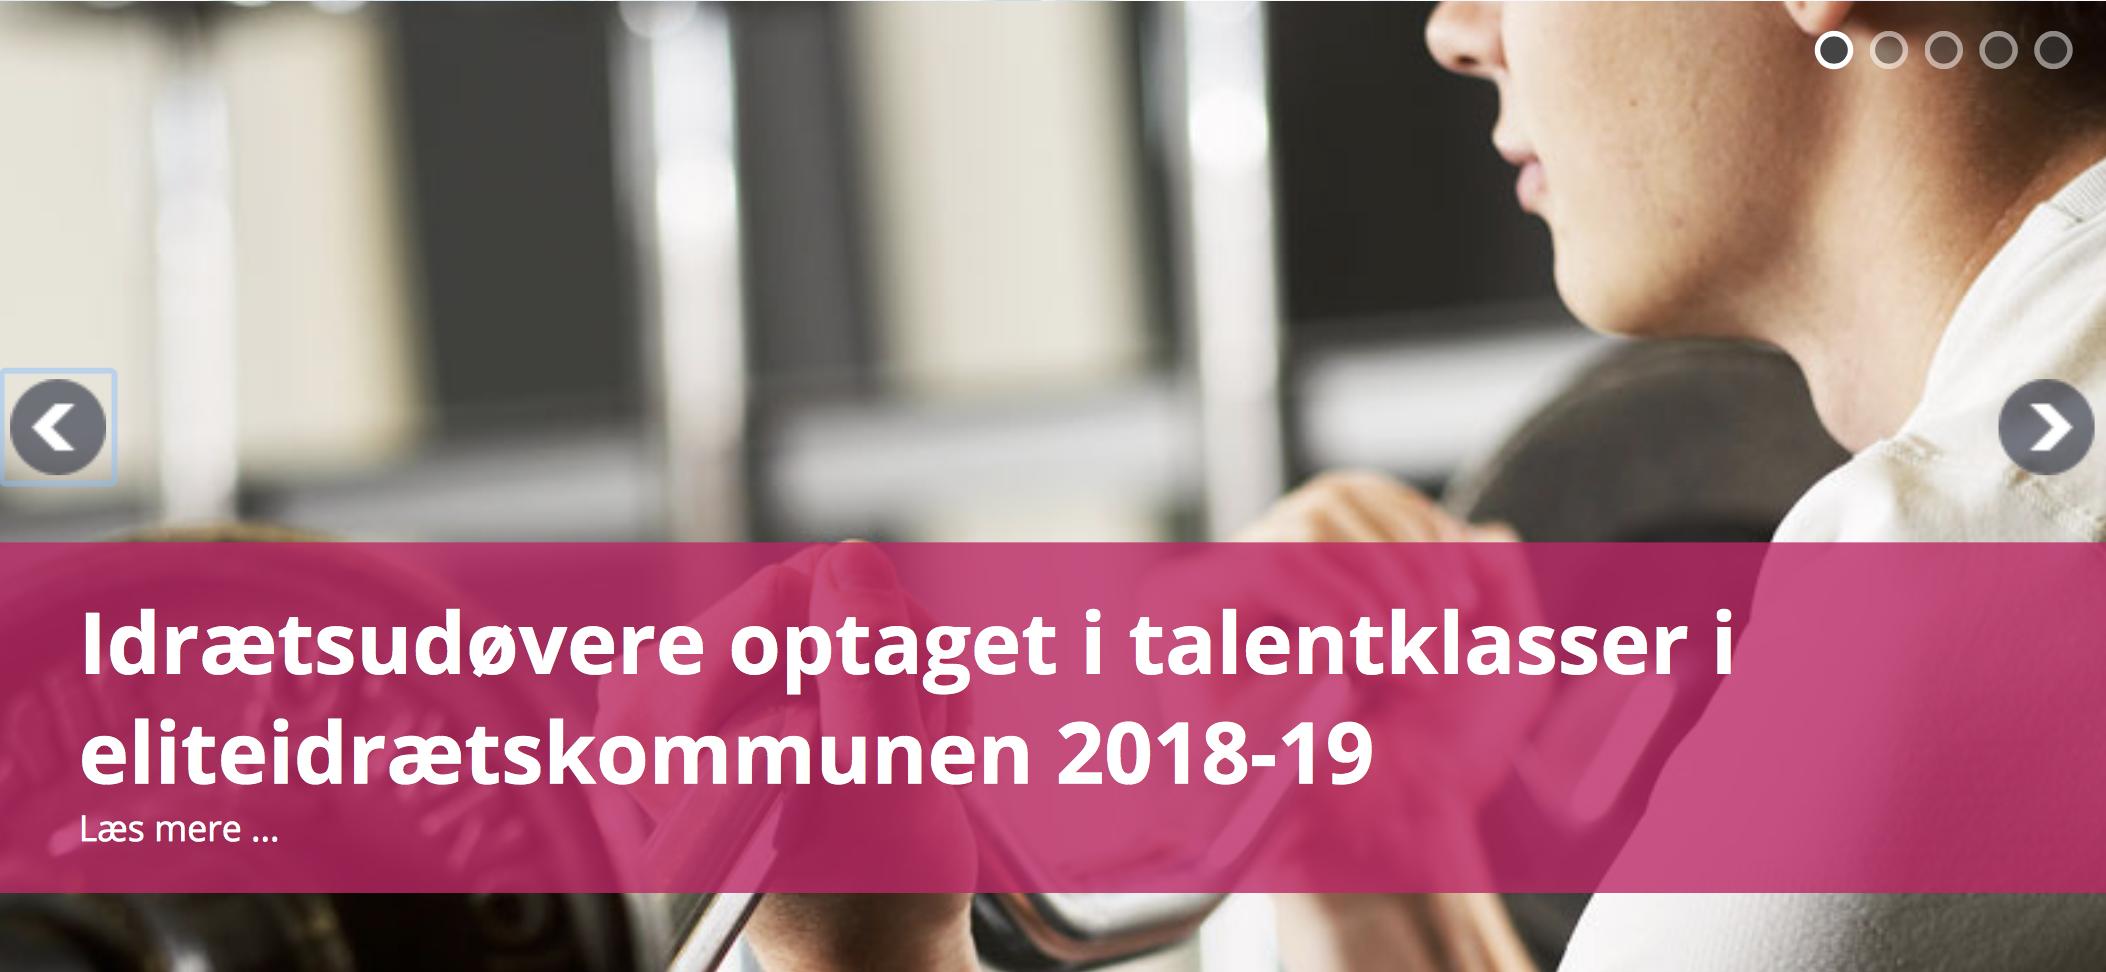 OPTIMALE RAMMER FOR TALENTTRÆNING : TALENTKLASSER FOR ÅR 2018/19 ER NETOP OFFENTLIGGJORT